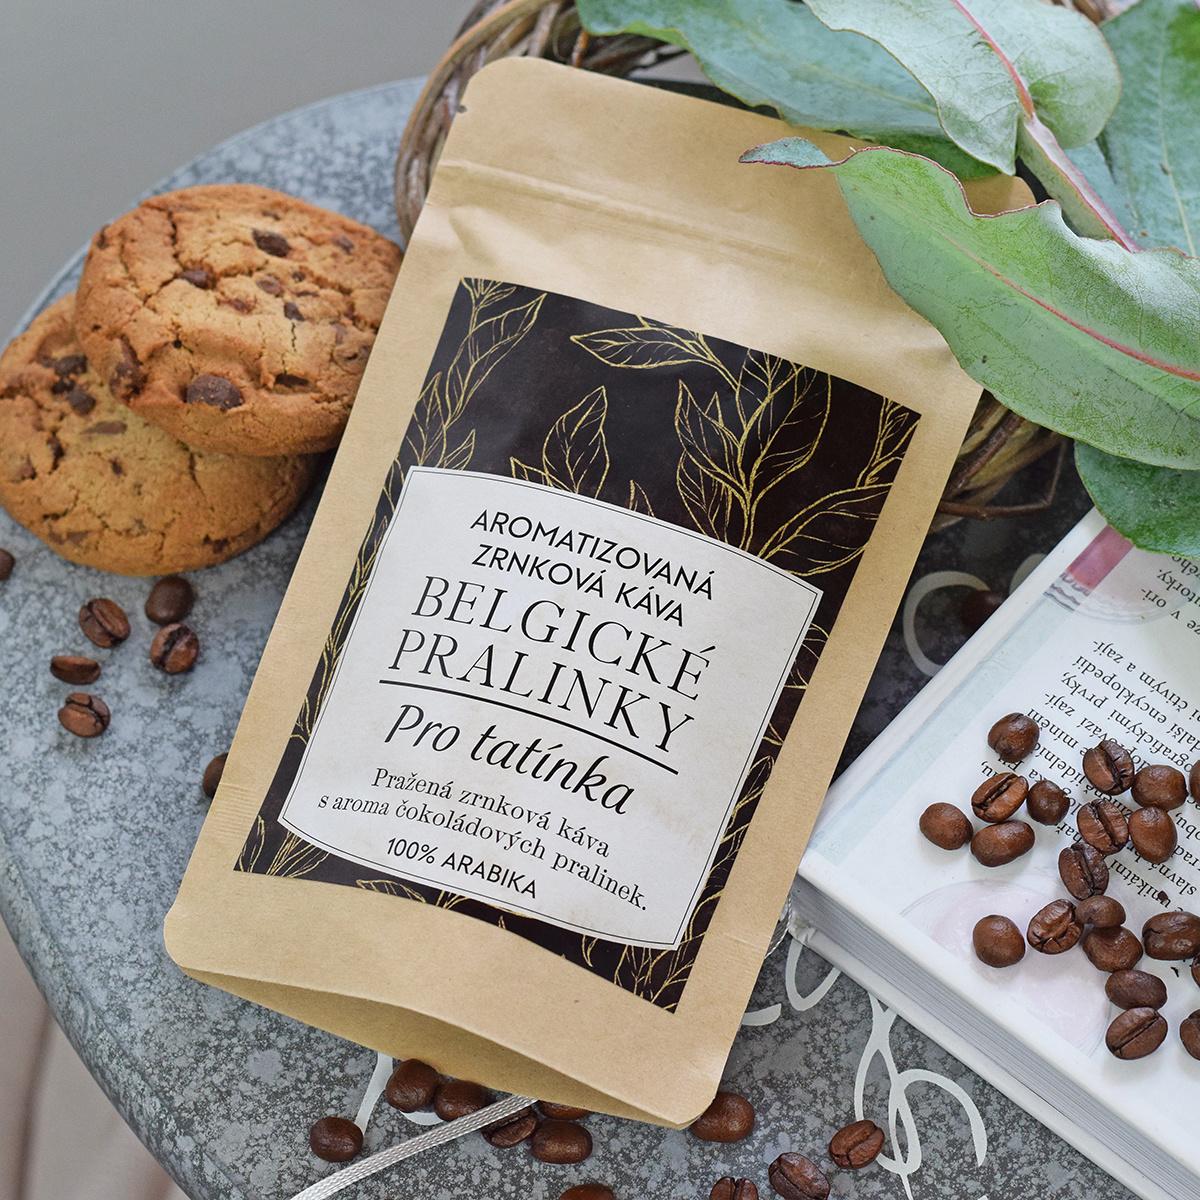 HOUSEDECOR Káva Belgické pralinky - pro tatínka